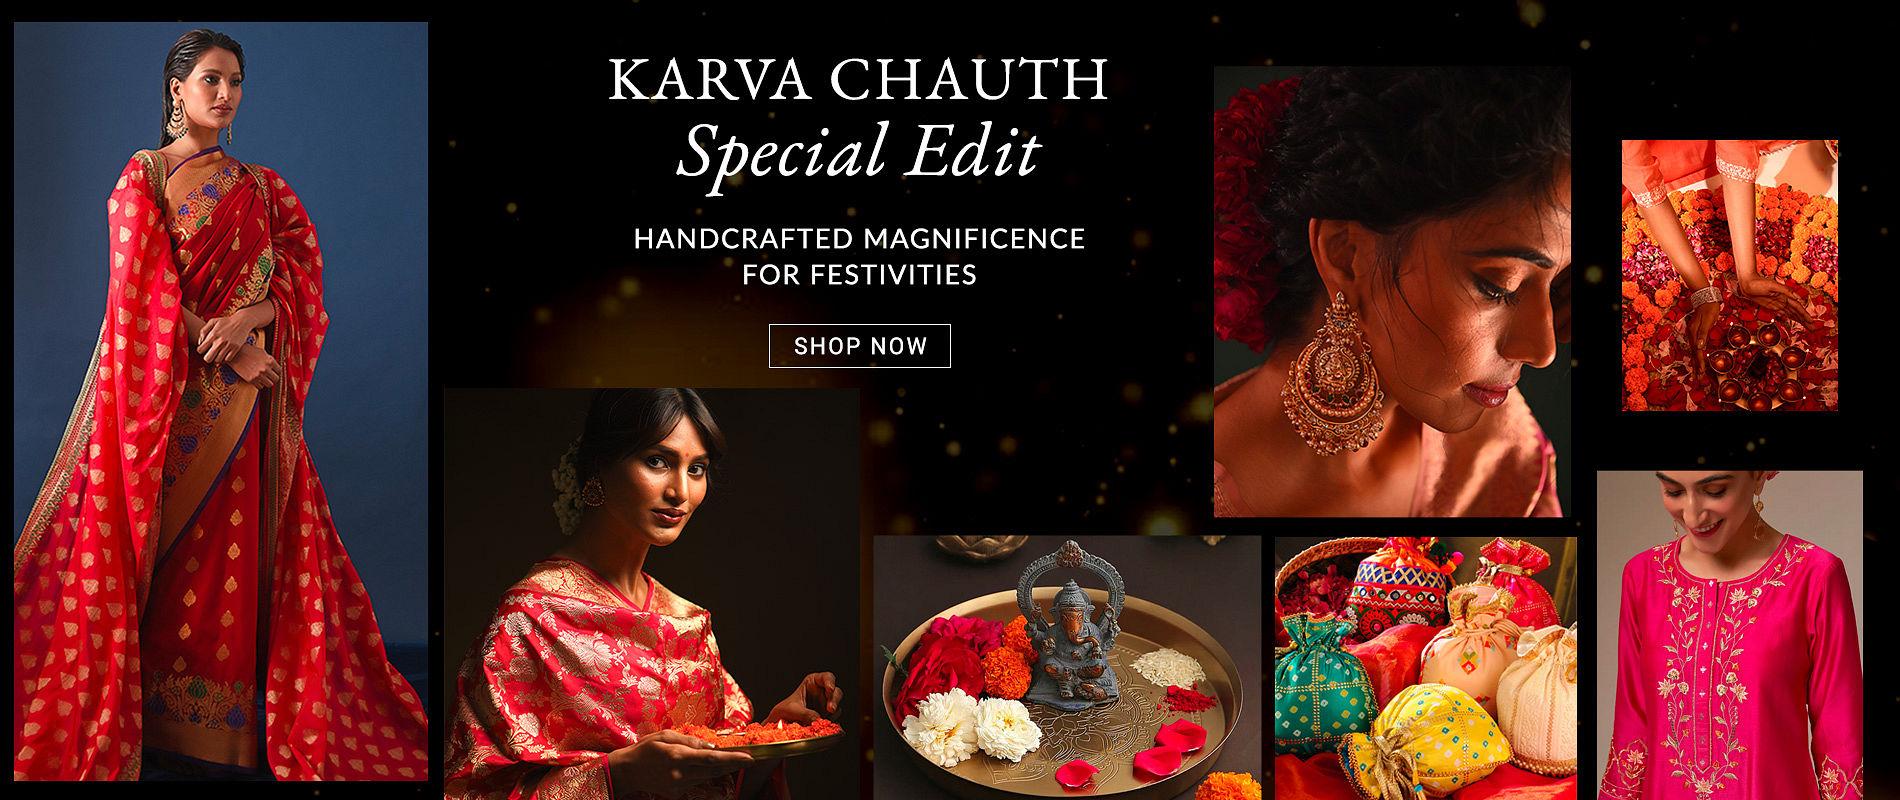 24092021_Karwa_Chawth_Curation